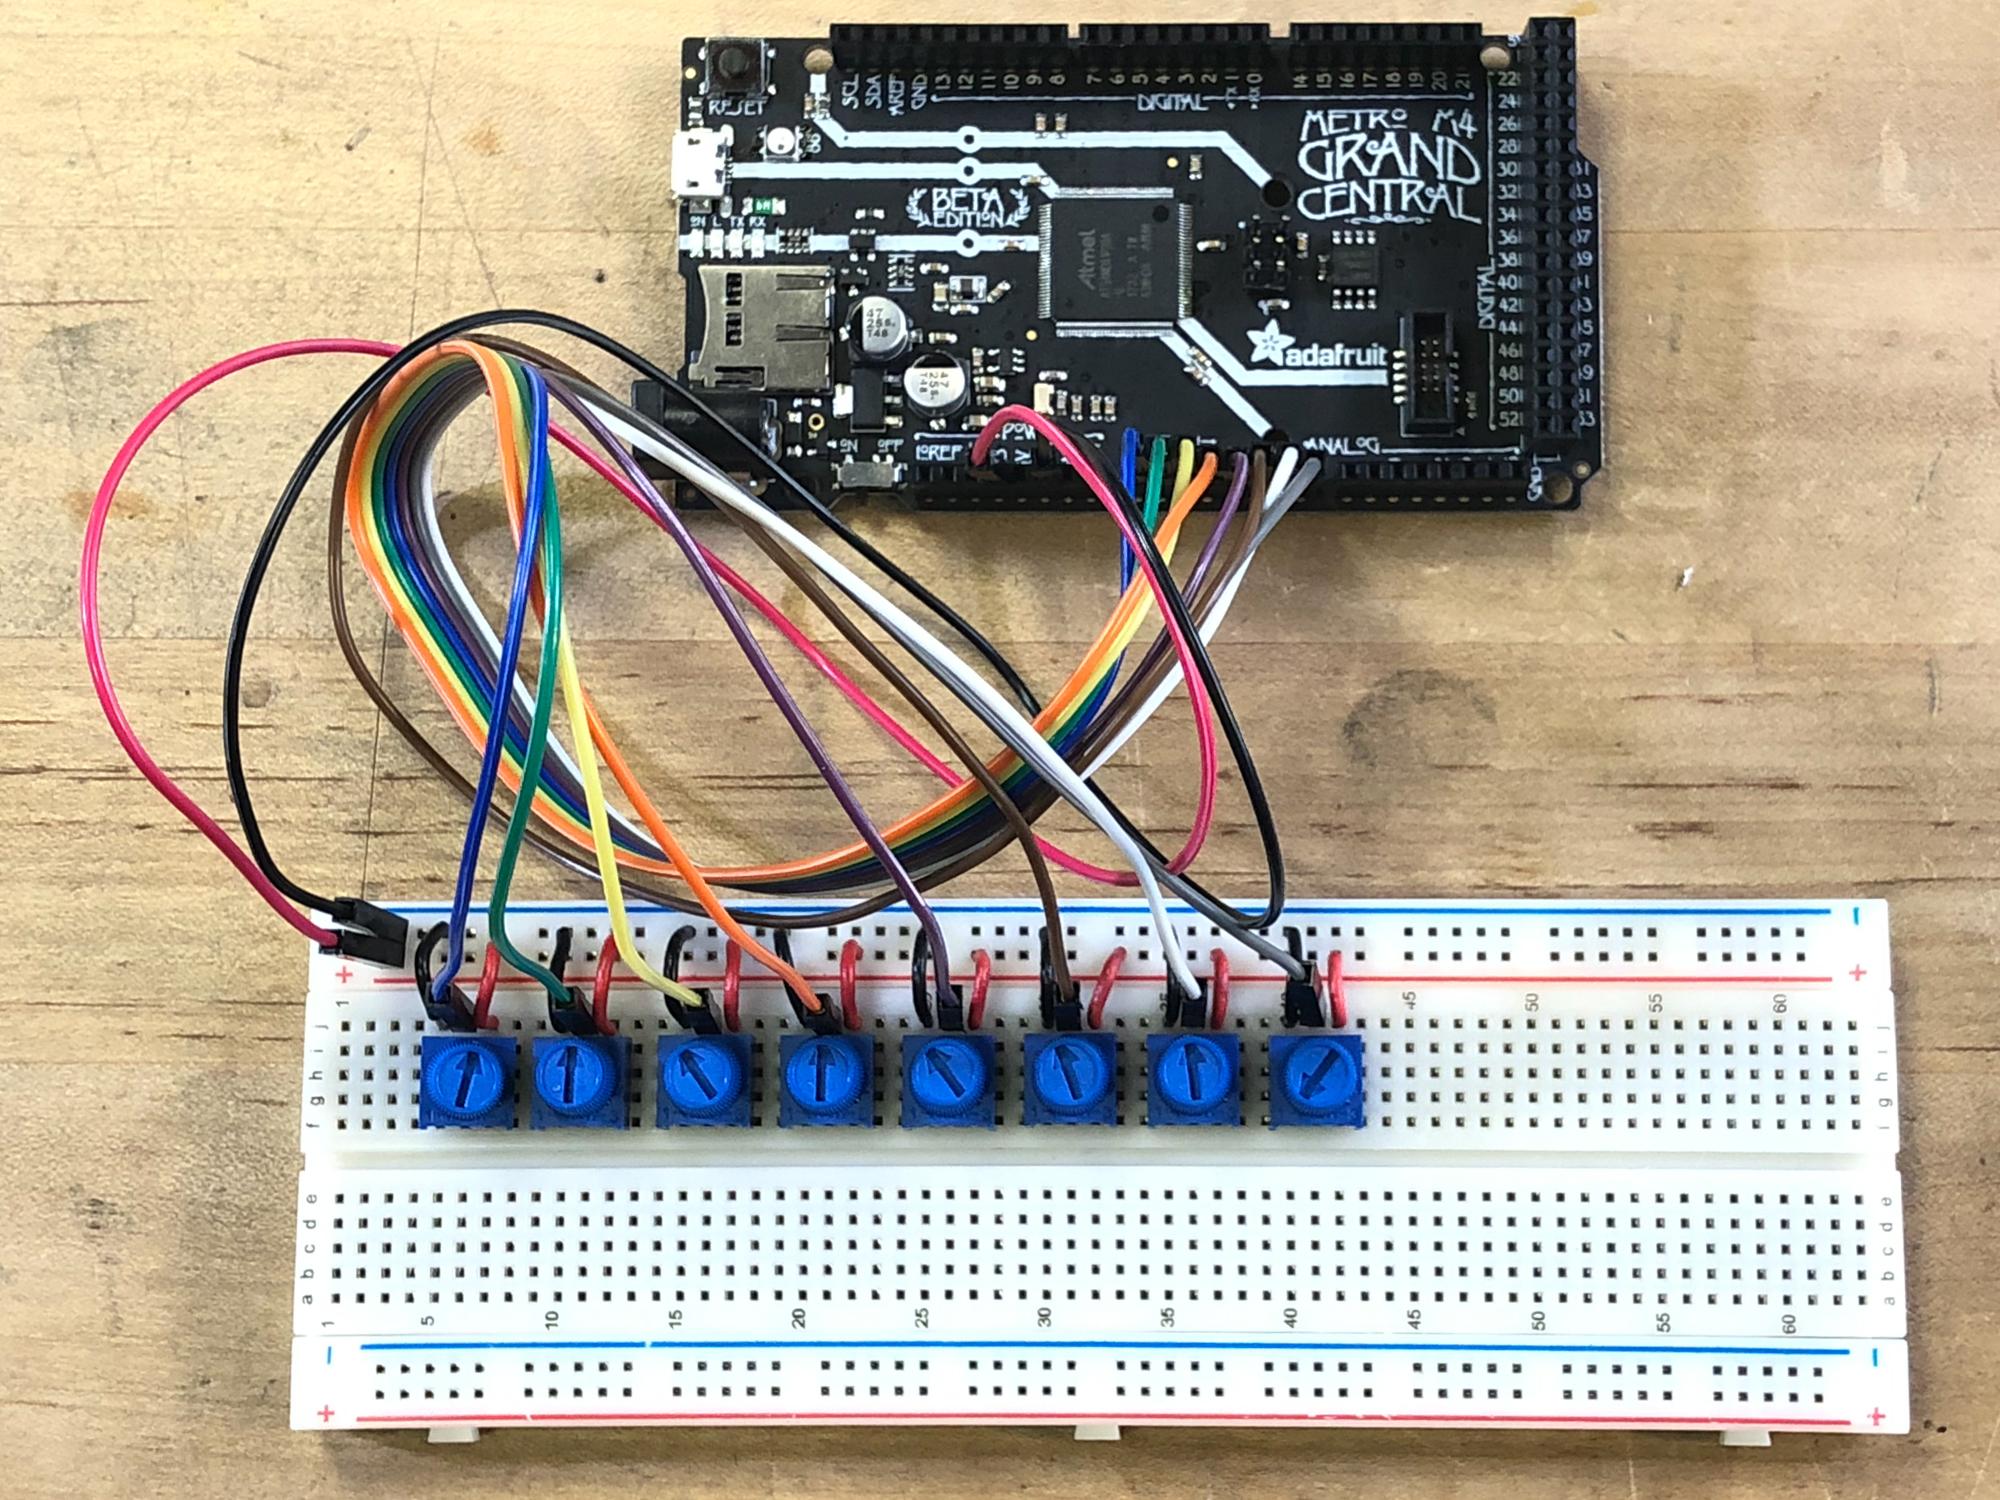 micropython___circuitpython_IMG_3569_2k.jpg